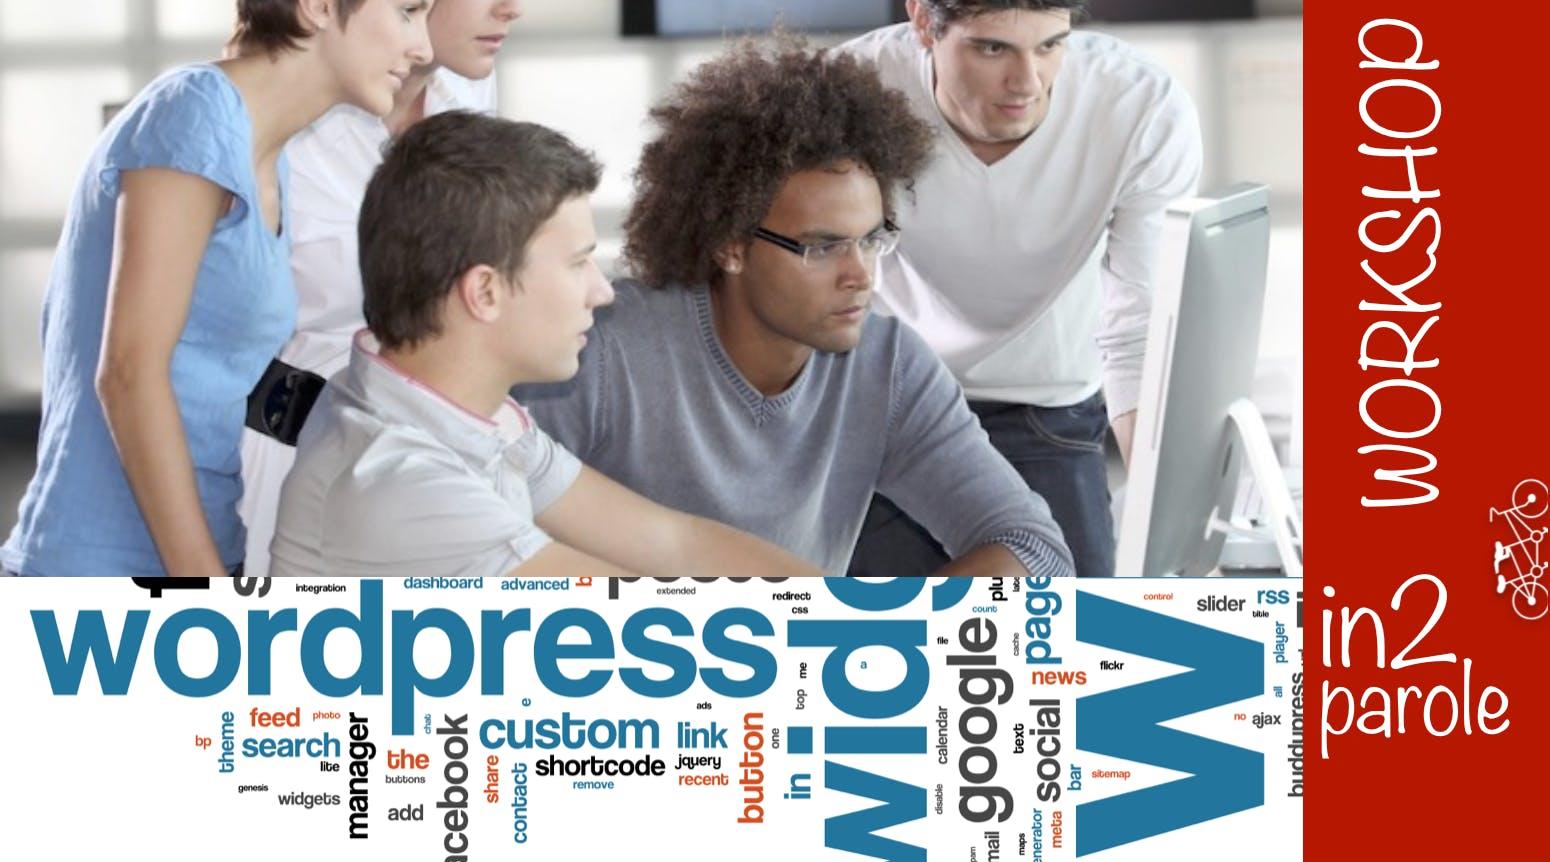 Blog, Sito, LandingPage - Wordpress ti aiuta